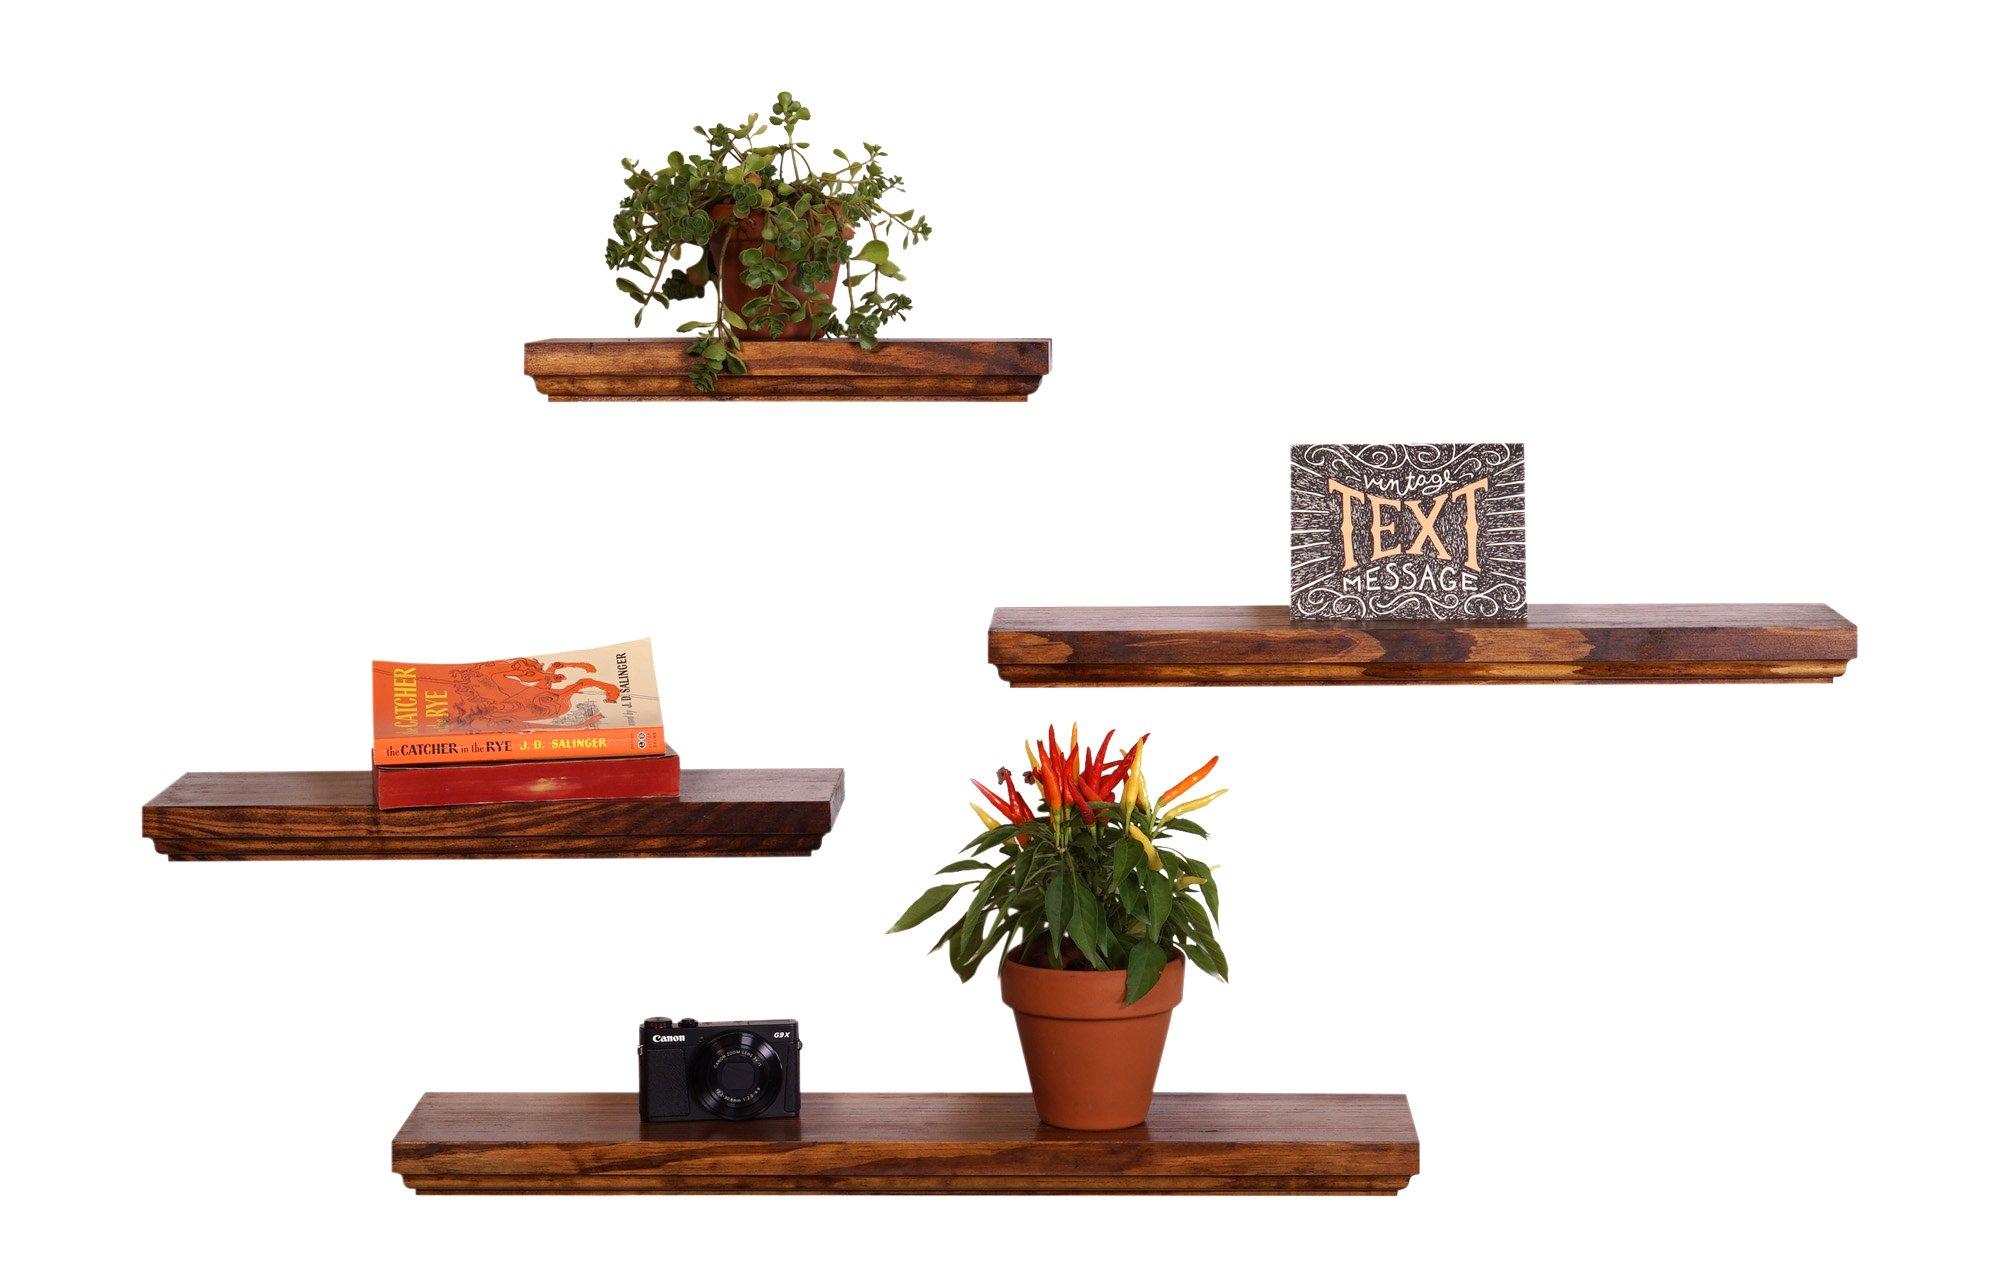 DAKODA LOVE Routed Edge Floating Shelves, USA Handmade, Clear Coat Finish, 100% Countersunk Hidden Floating Shelf Brackets, Beautiful Grain Pine Wood Wall Decor (Set of 4) (Bourbon)